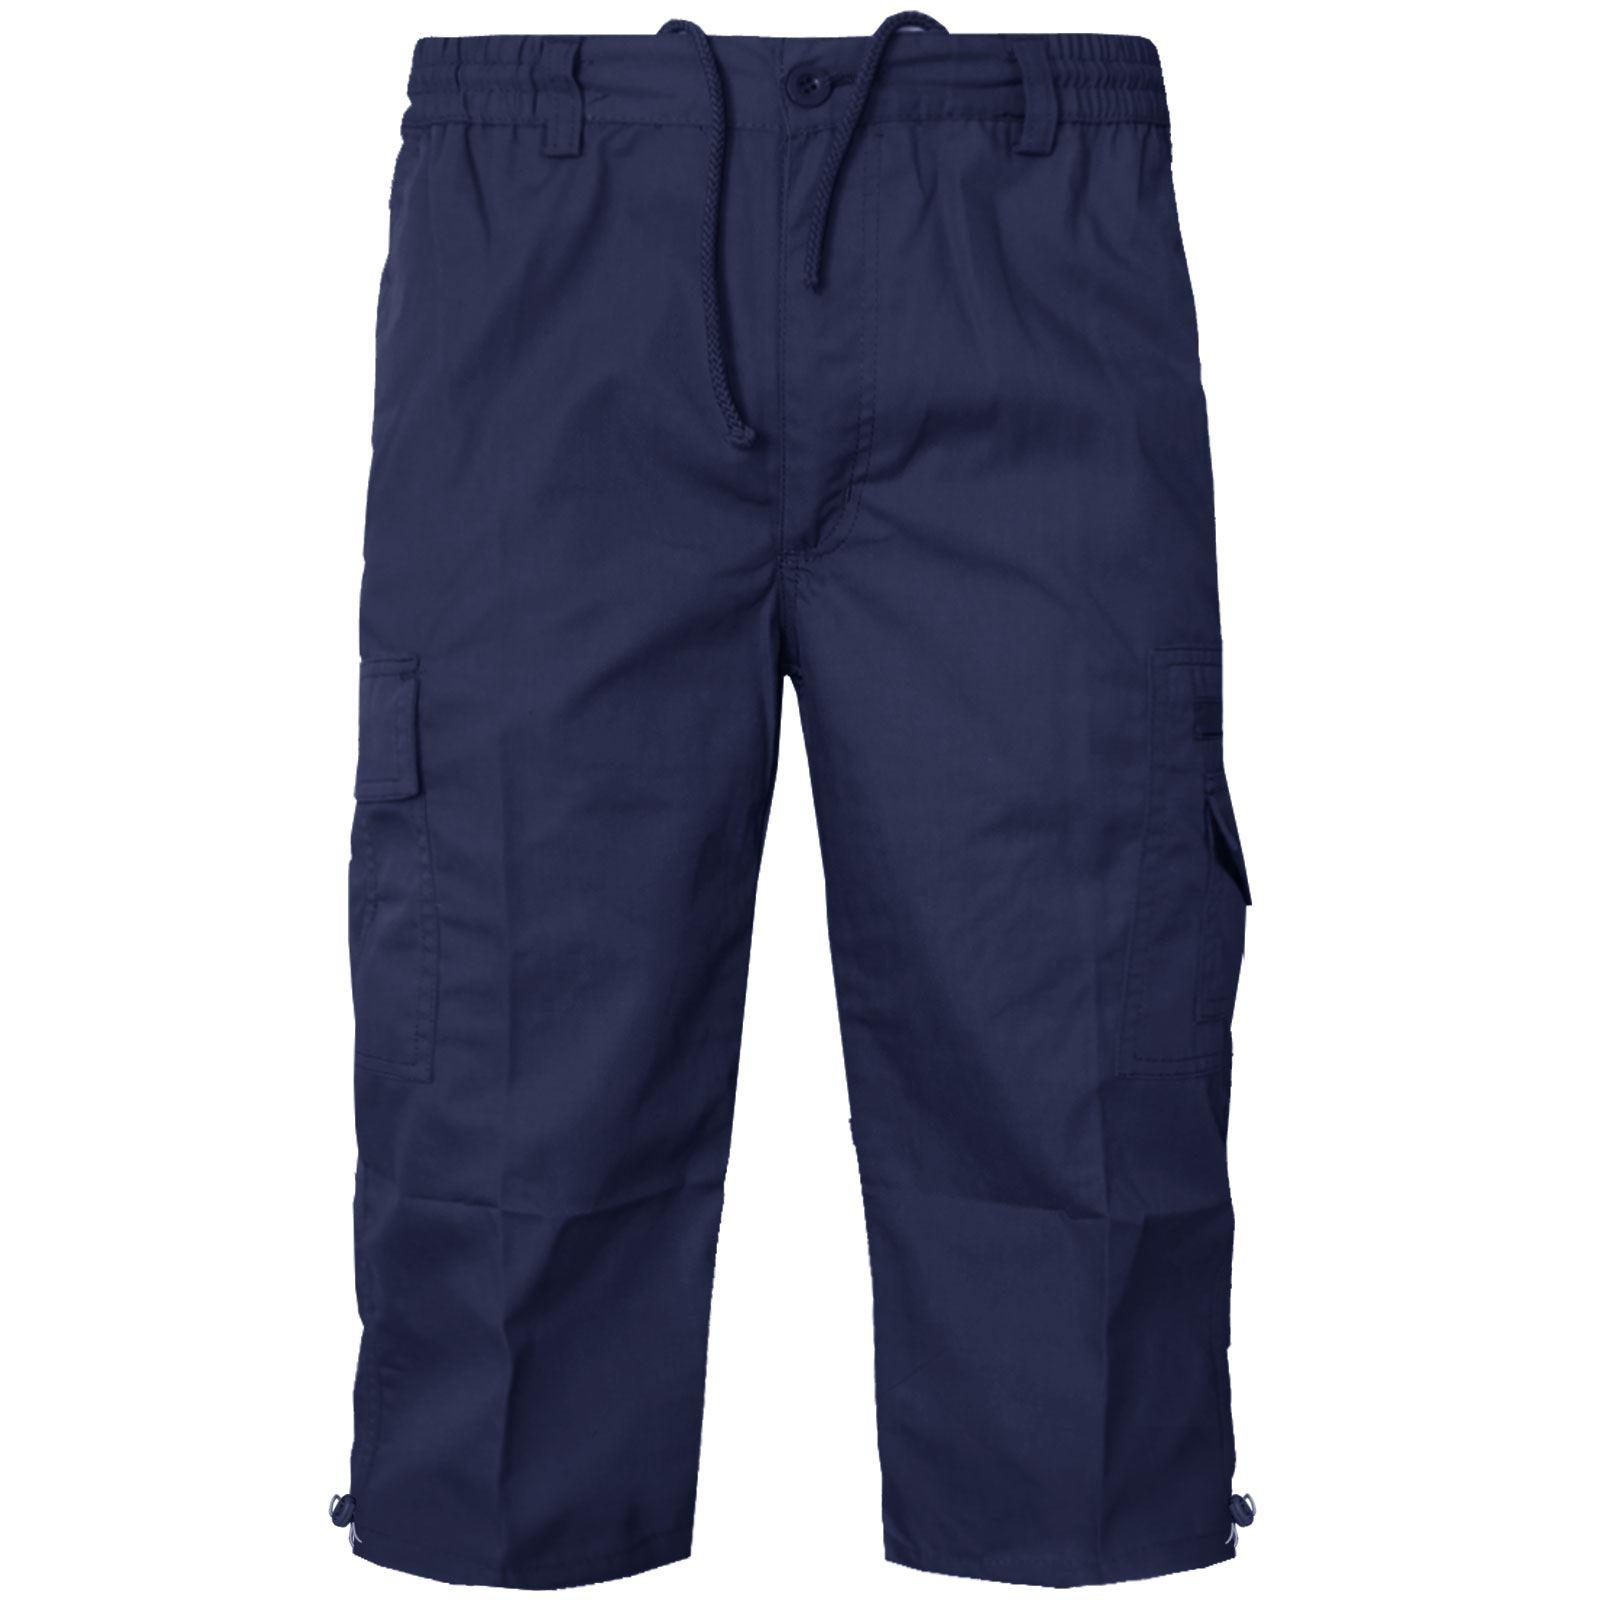 NEW MENS 3//4 SHORTS CARGO COMBAT PLAIN COTTON CASUAL SUMMER BEACH POCKETS PANTS